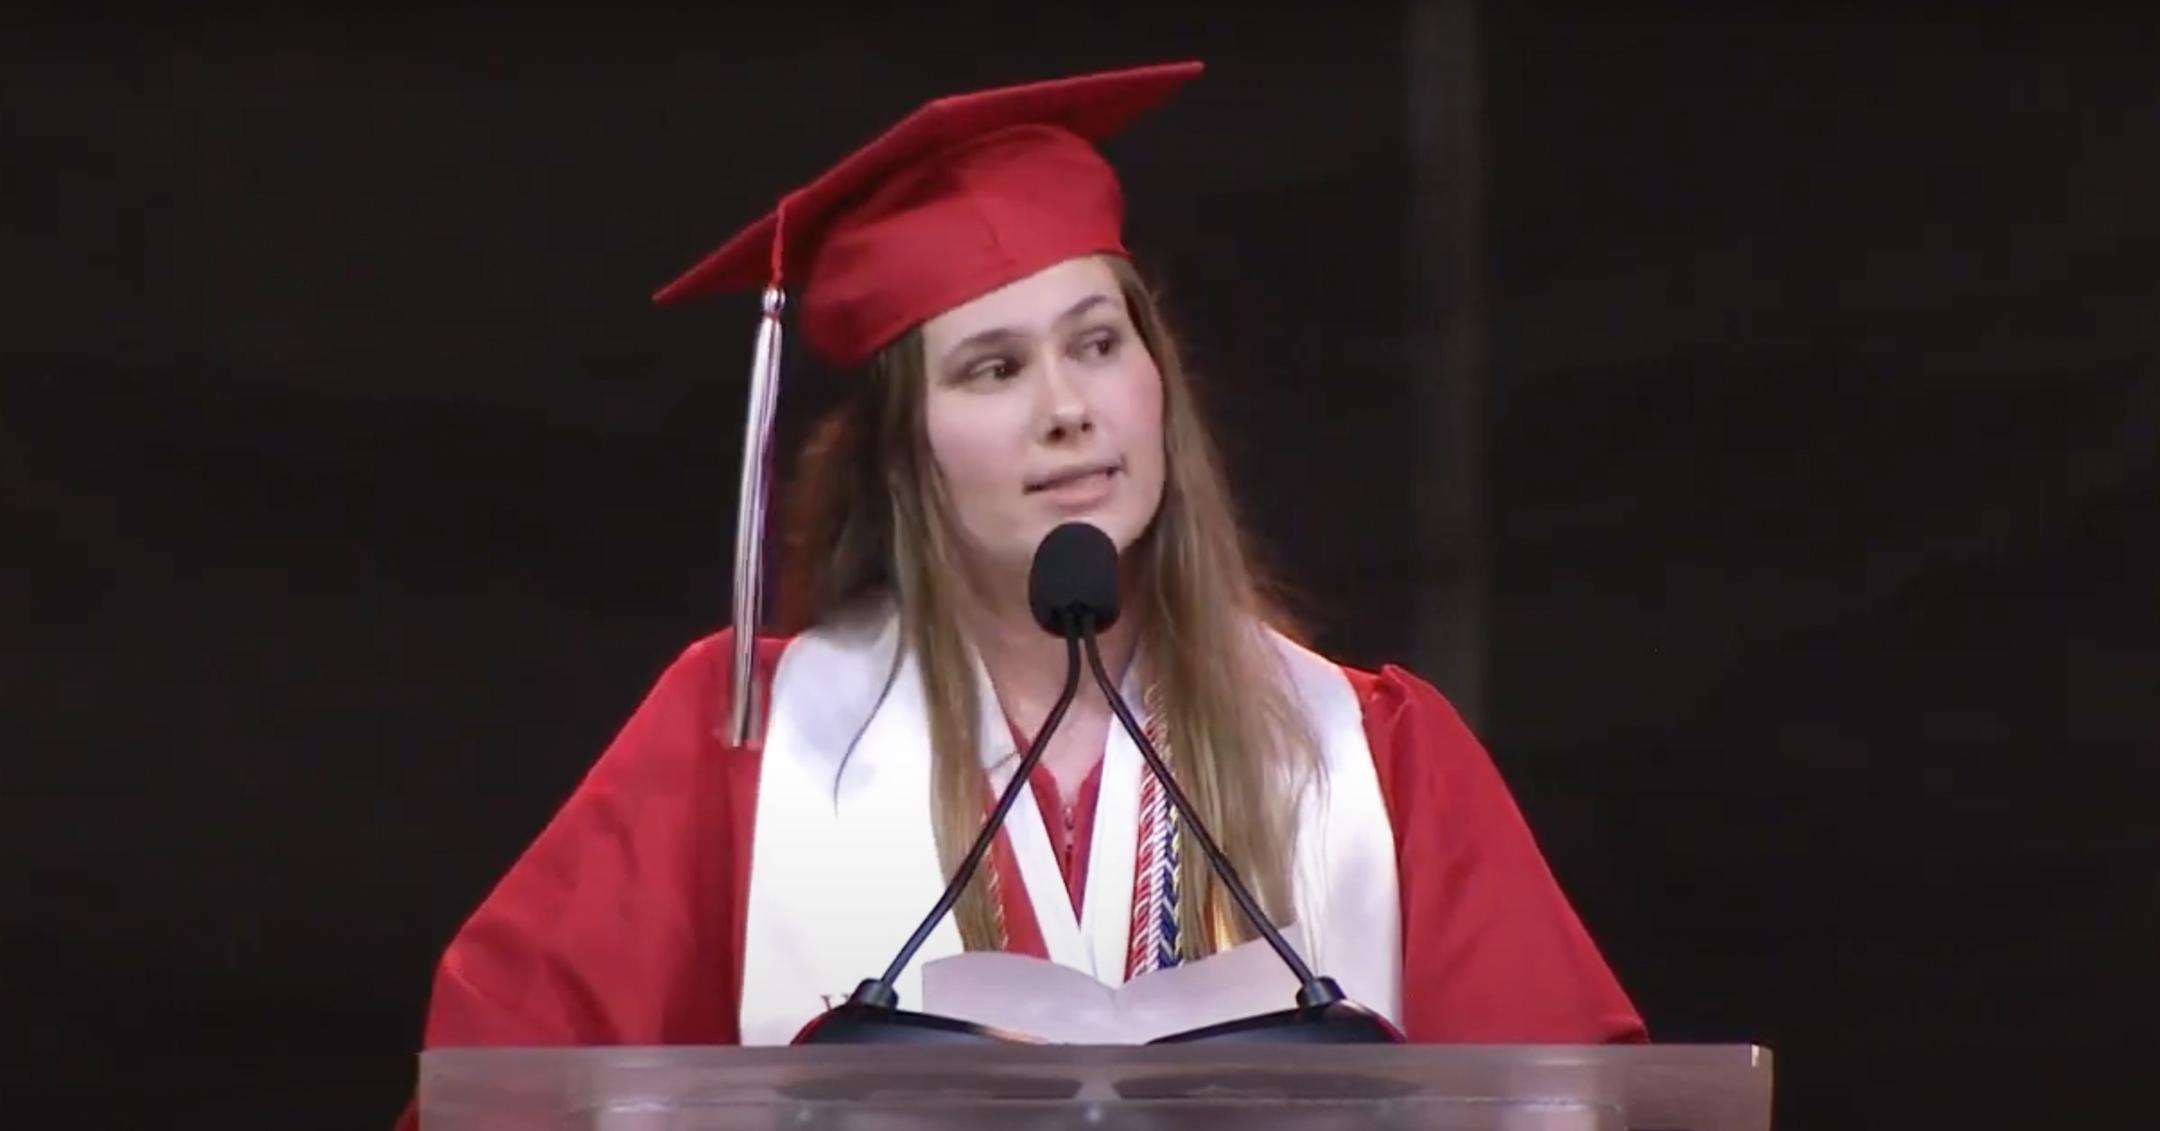 dallas valedictorian slams texas abortion law in graduation speech